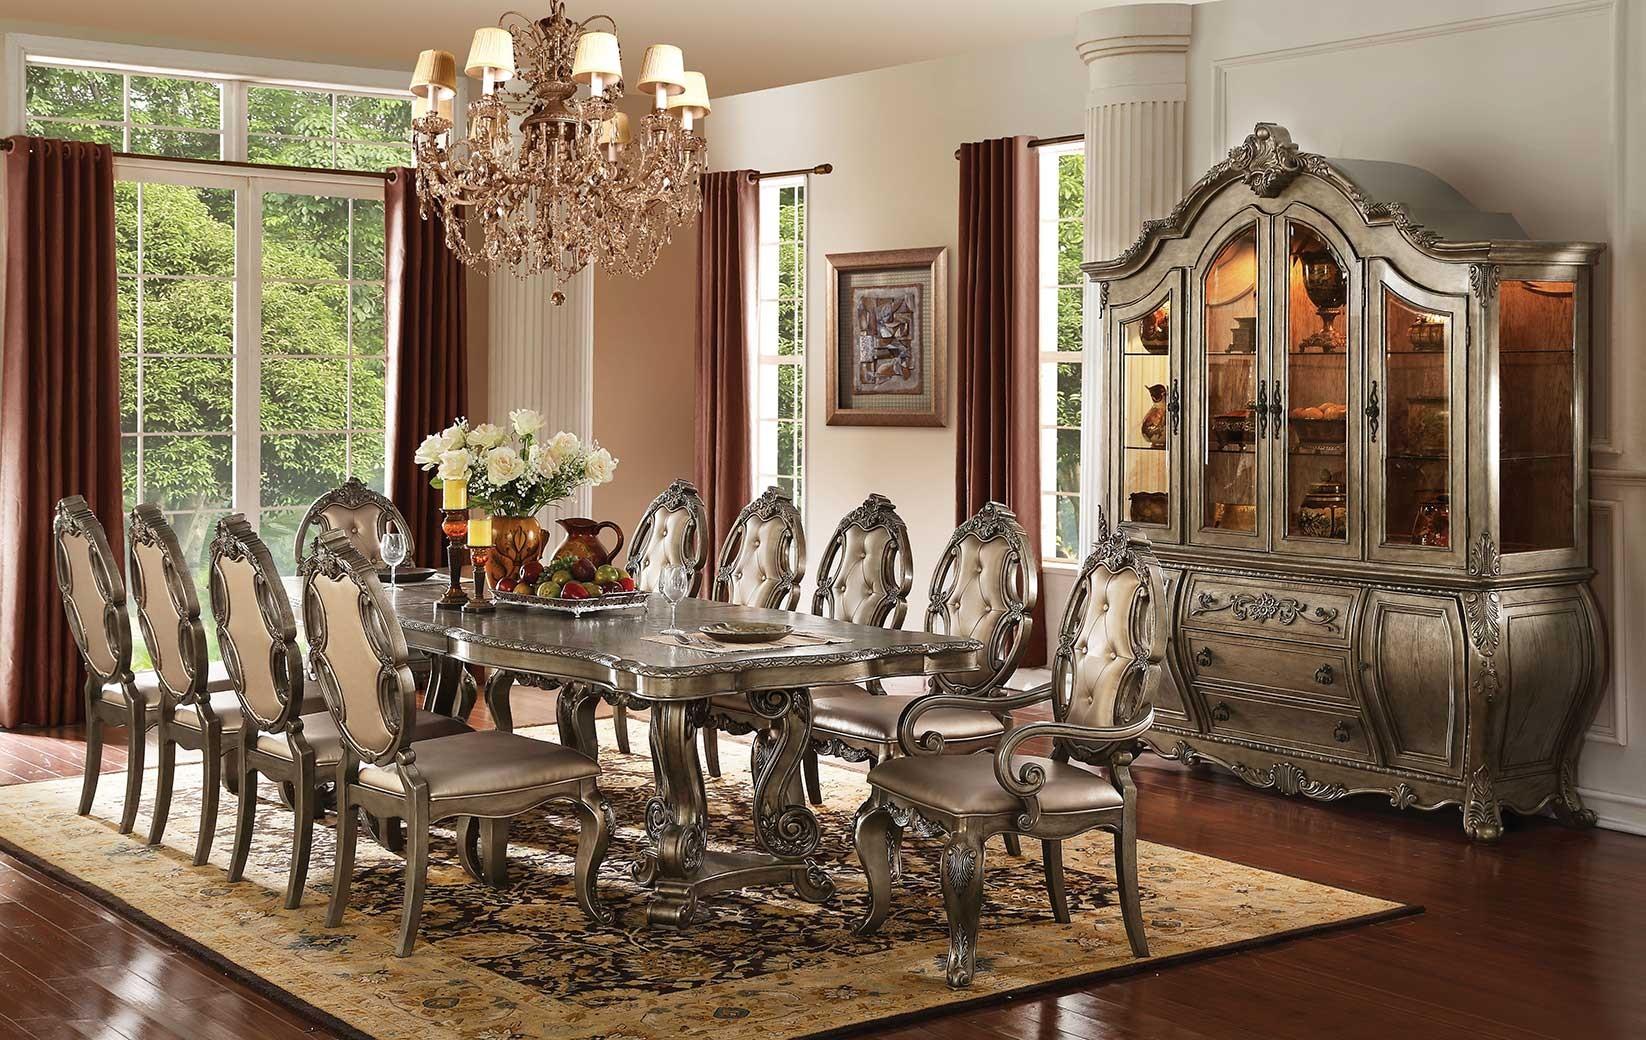 61290 Acme Dining Table Ragenardus Collection in Vintage Oak